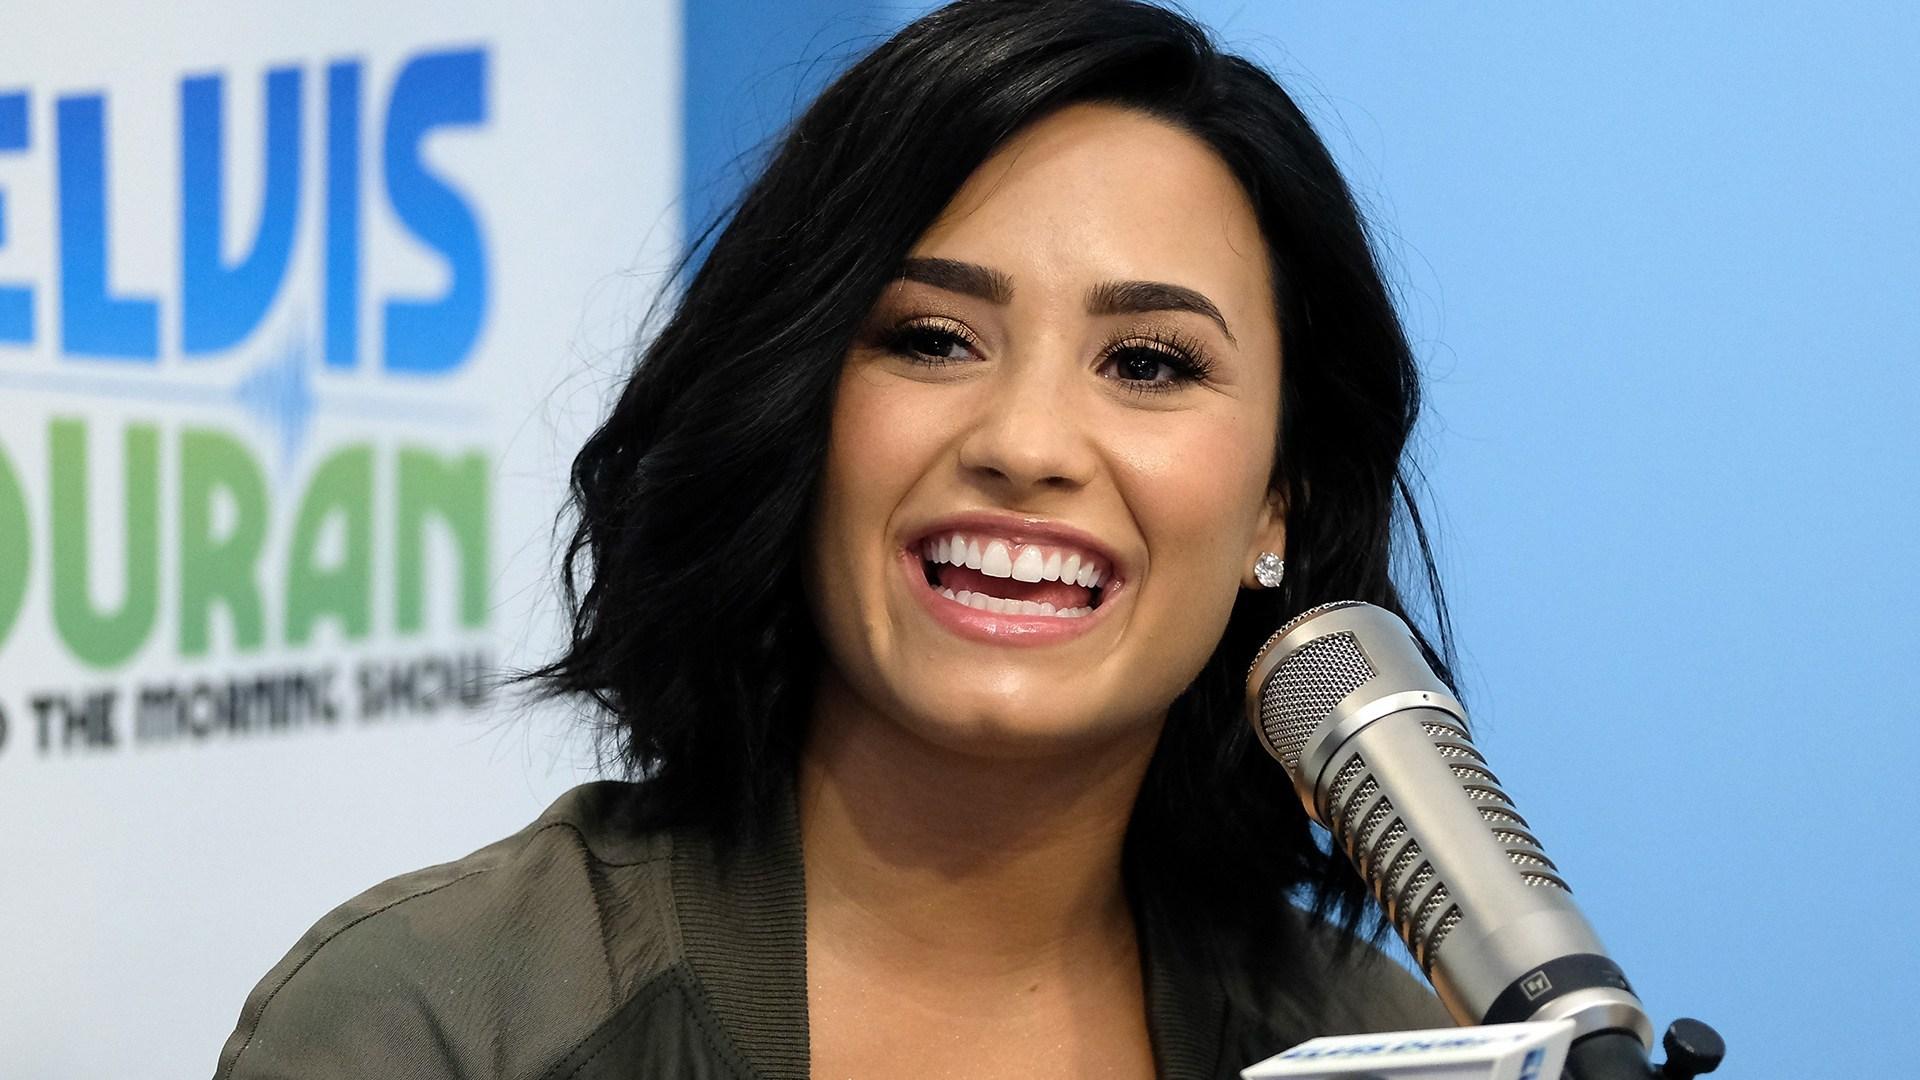 A un año de la sobredosis, revelan que Demi Lovato sufre nuevo cuadro depresivo